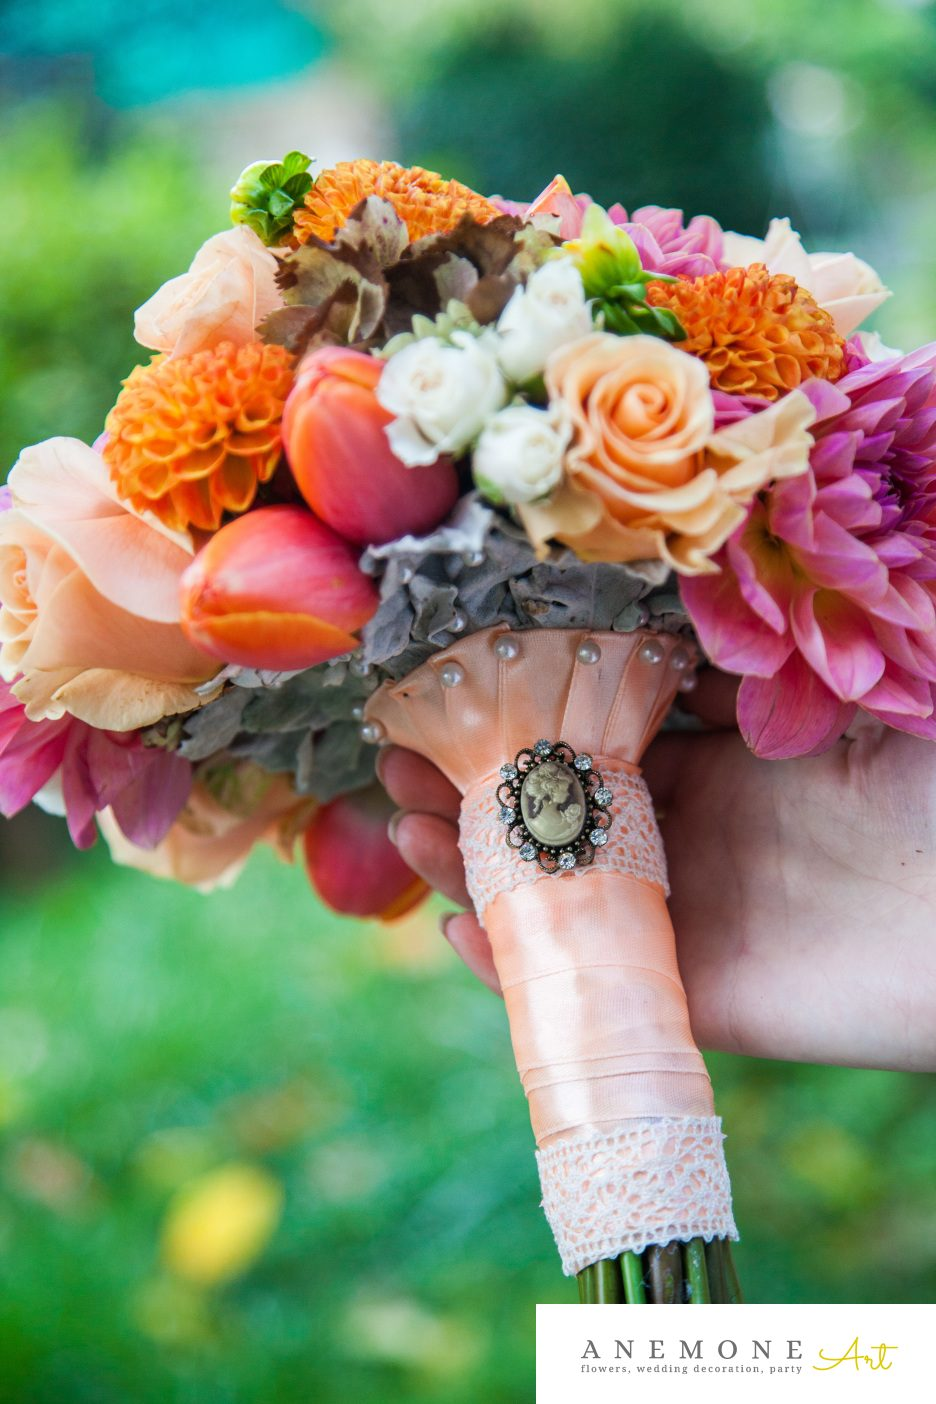 Poza, foto cu Flori de nunta buchet mireasa, caramiziu, maner buchet, piersica, portocaliu, rotund, roz in Arad, Timisoara, Oradea (wedding flowers, bouquets) nunta Arad, Timisoara, Oradea